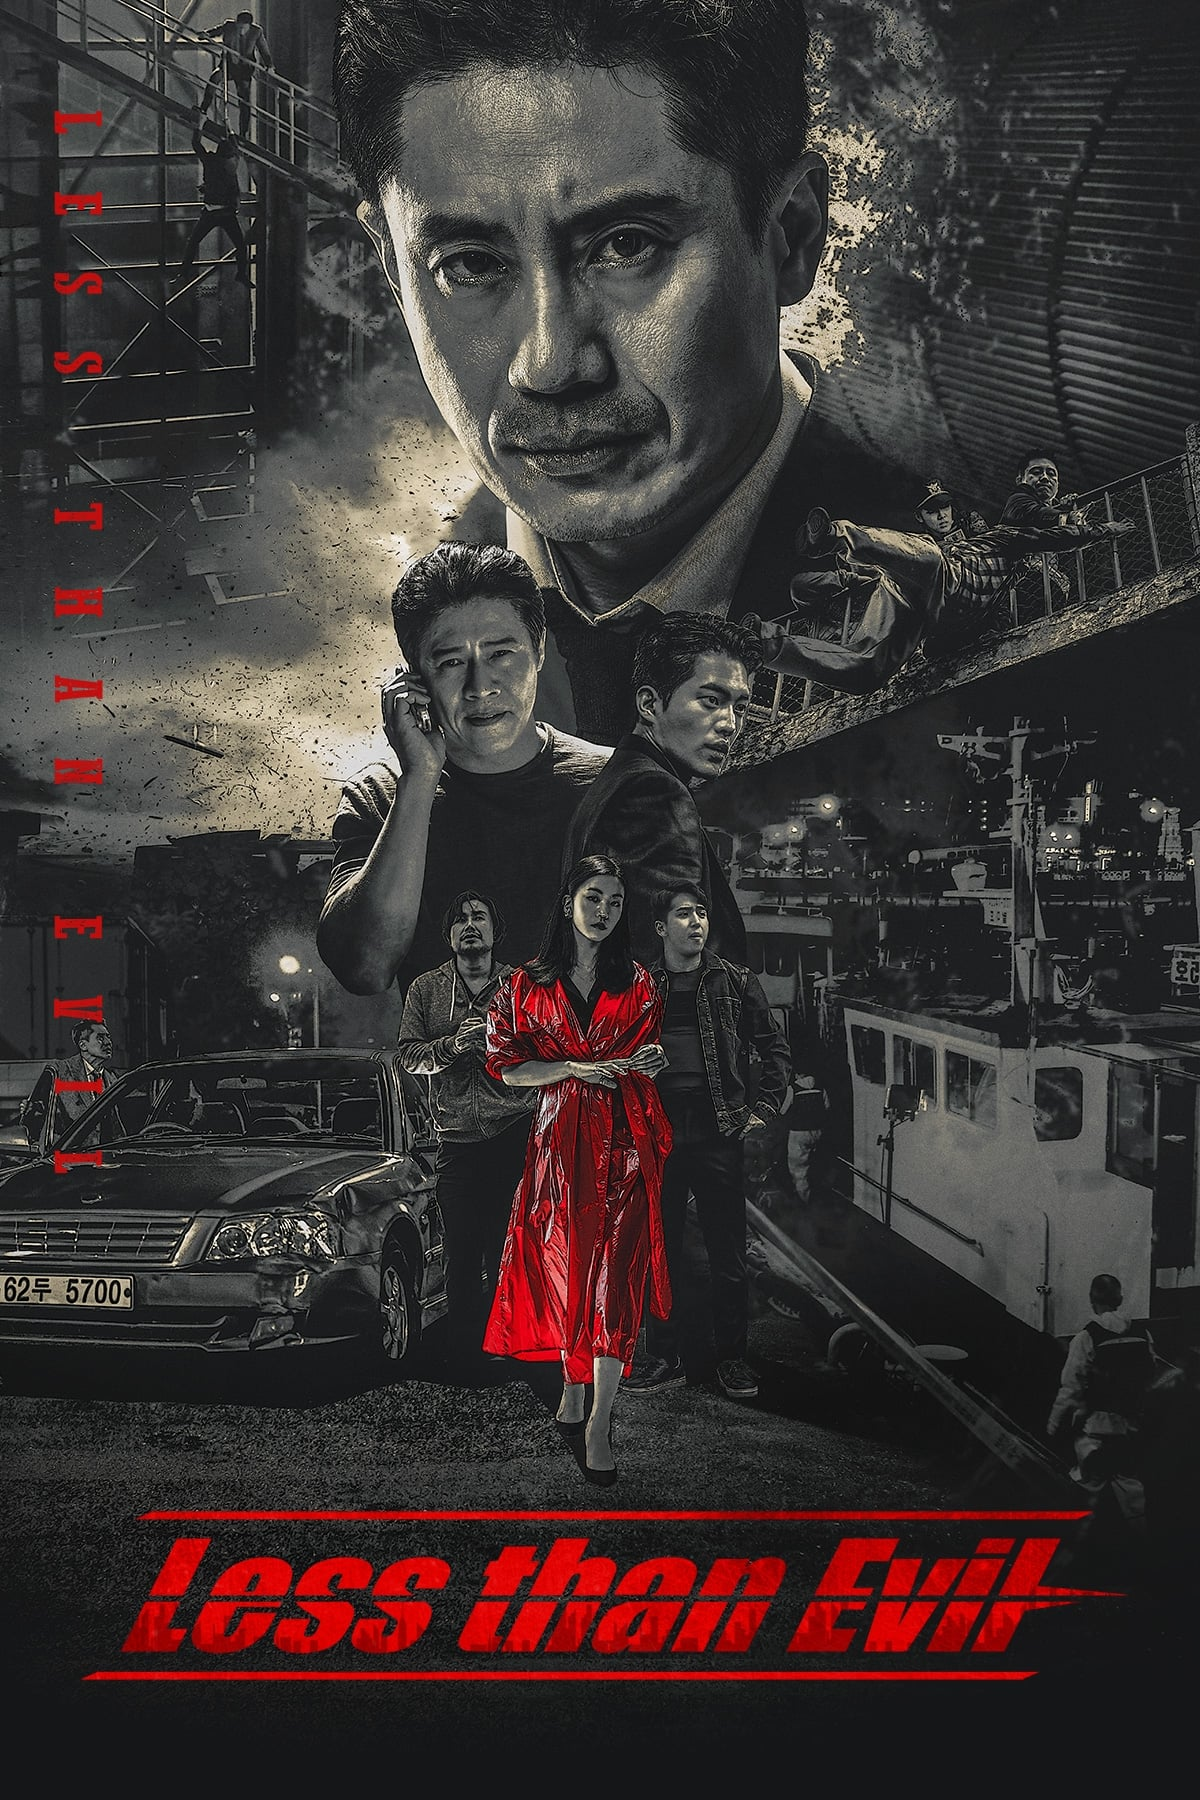 Less than Evil (Bad Detective) Episode 1